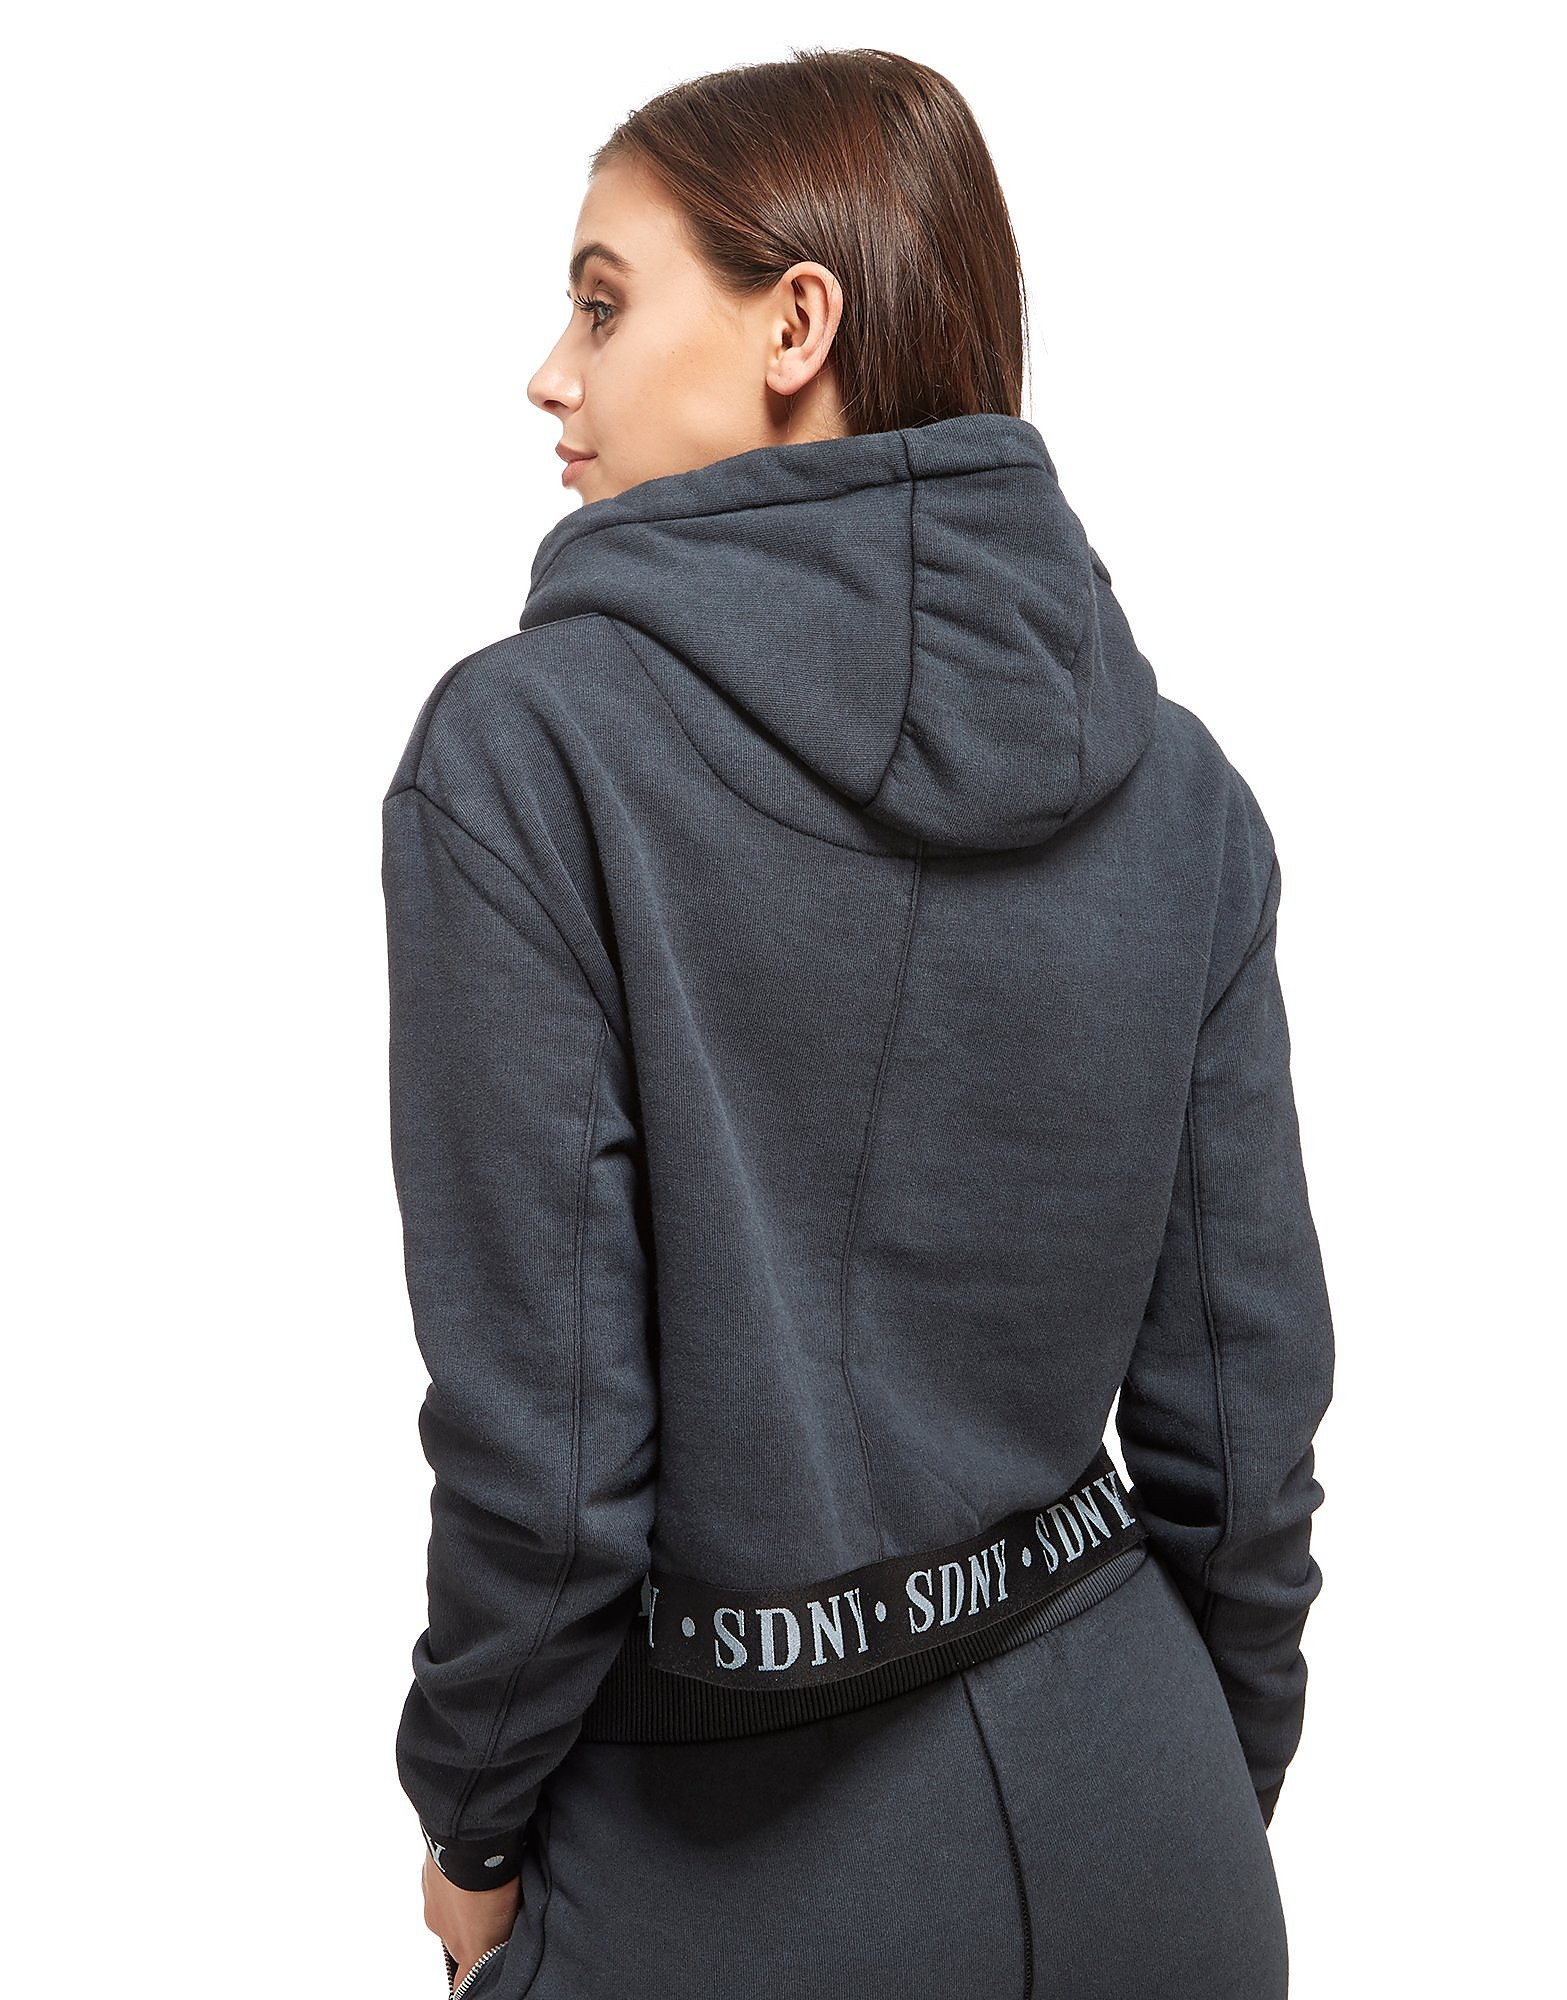 Supply & Demand Boxy Half Zip Hoody